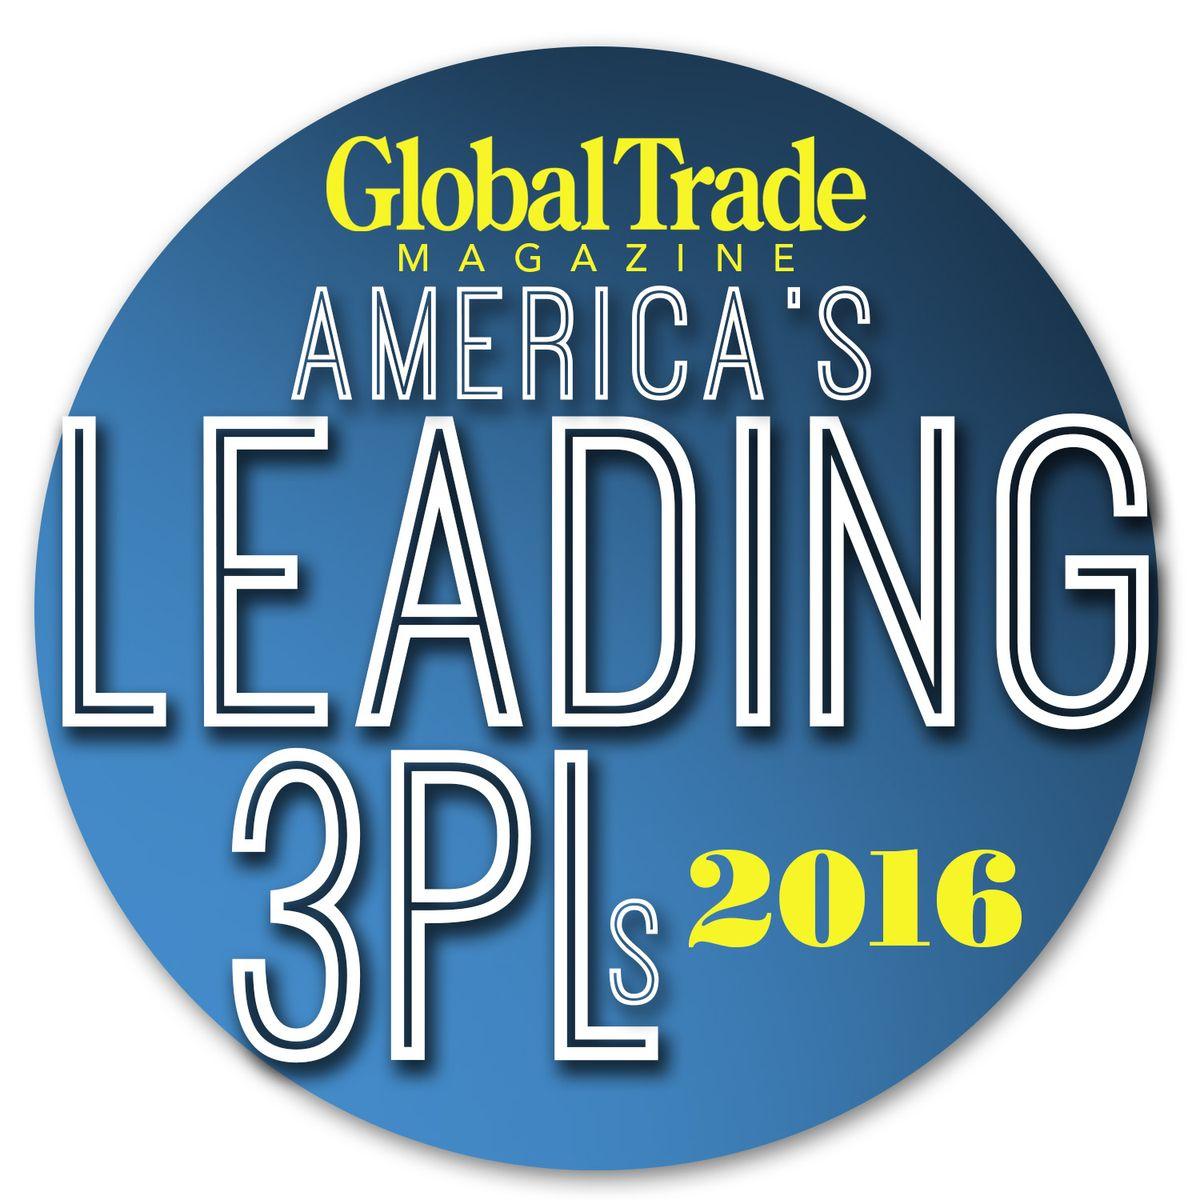 Global Trade Magazine Includes Penske Logistics Among America's Leading 3PLs